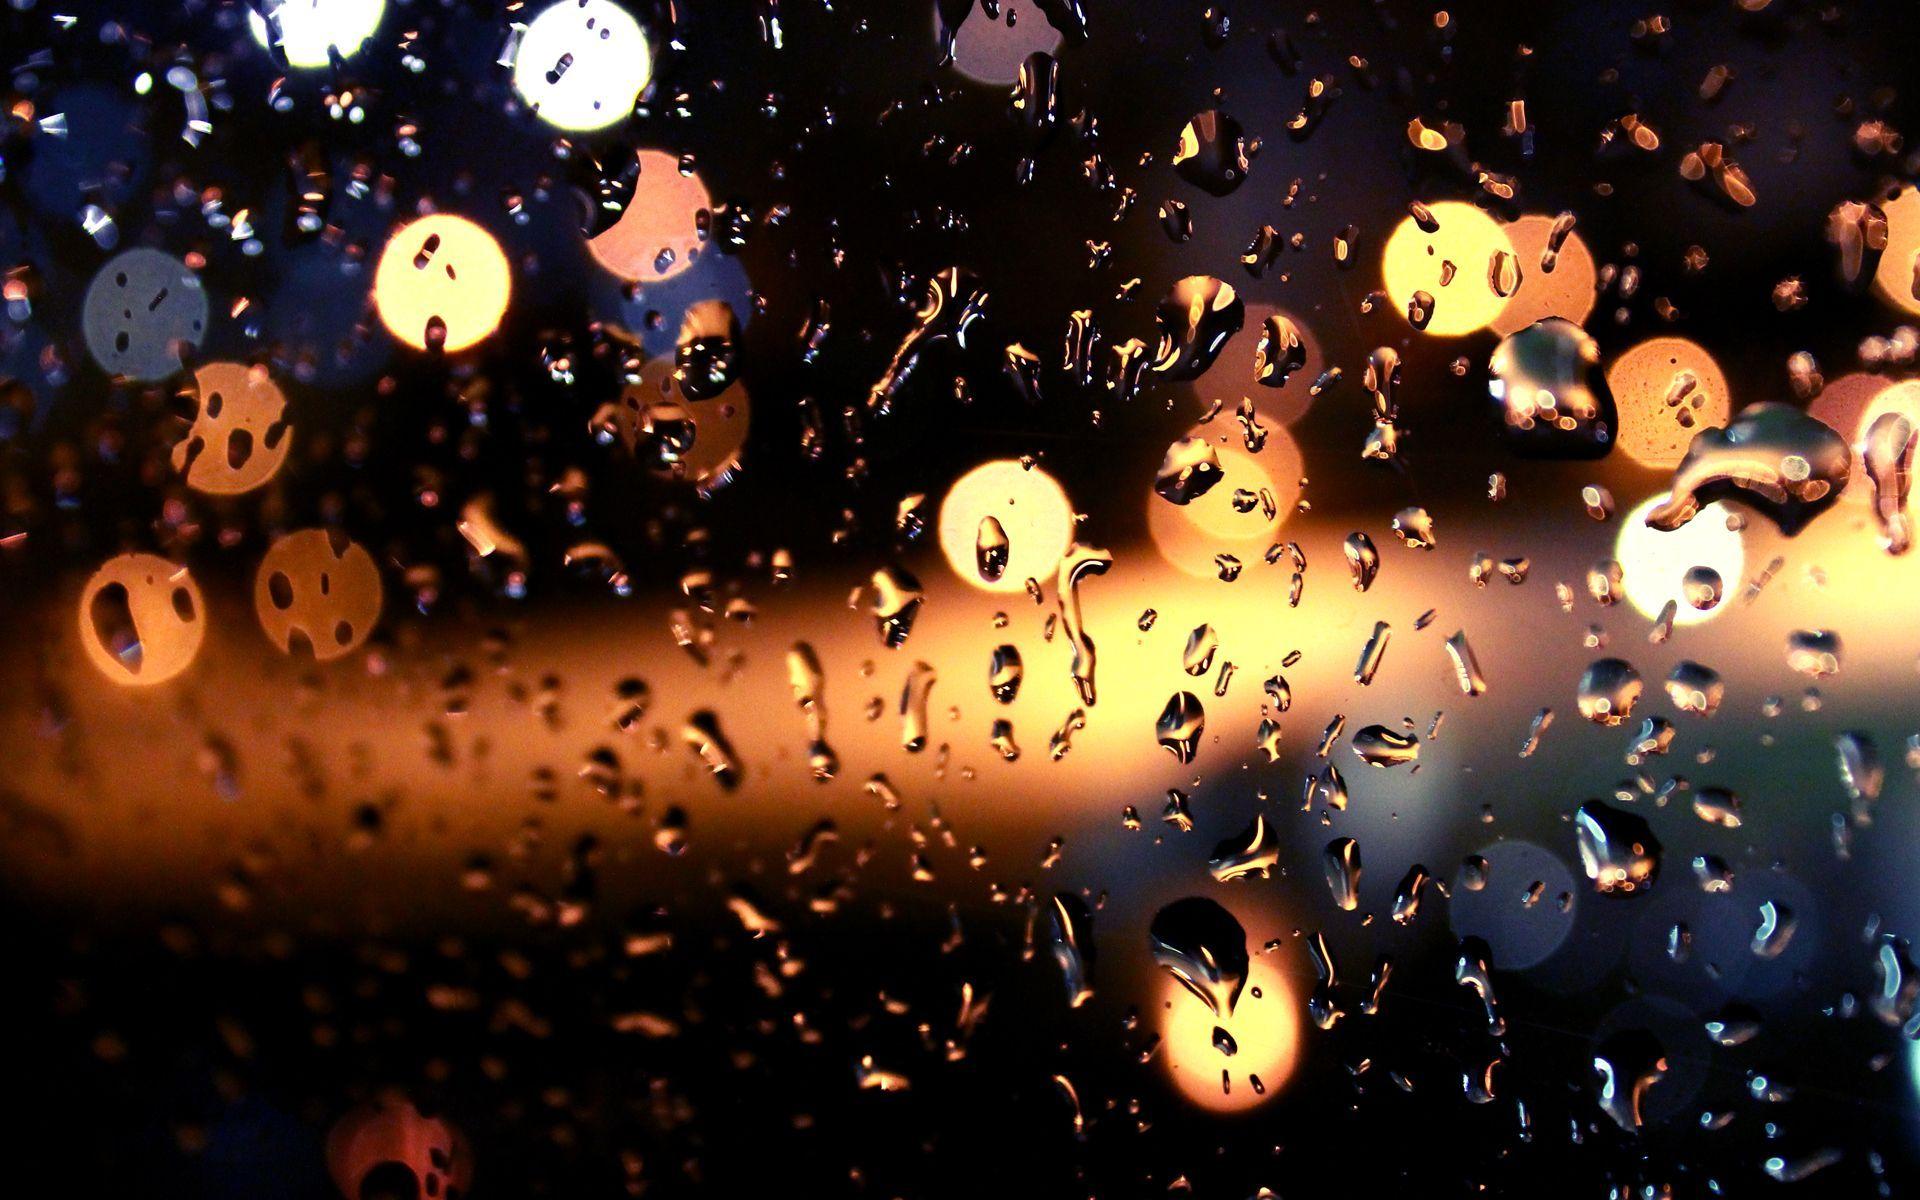 raindrops window lights wallpaper hd 50542